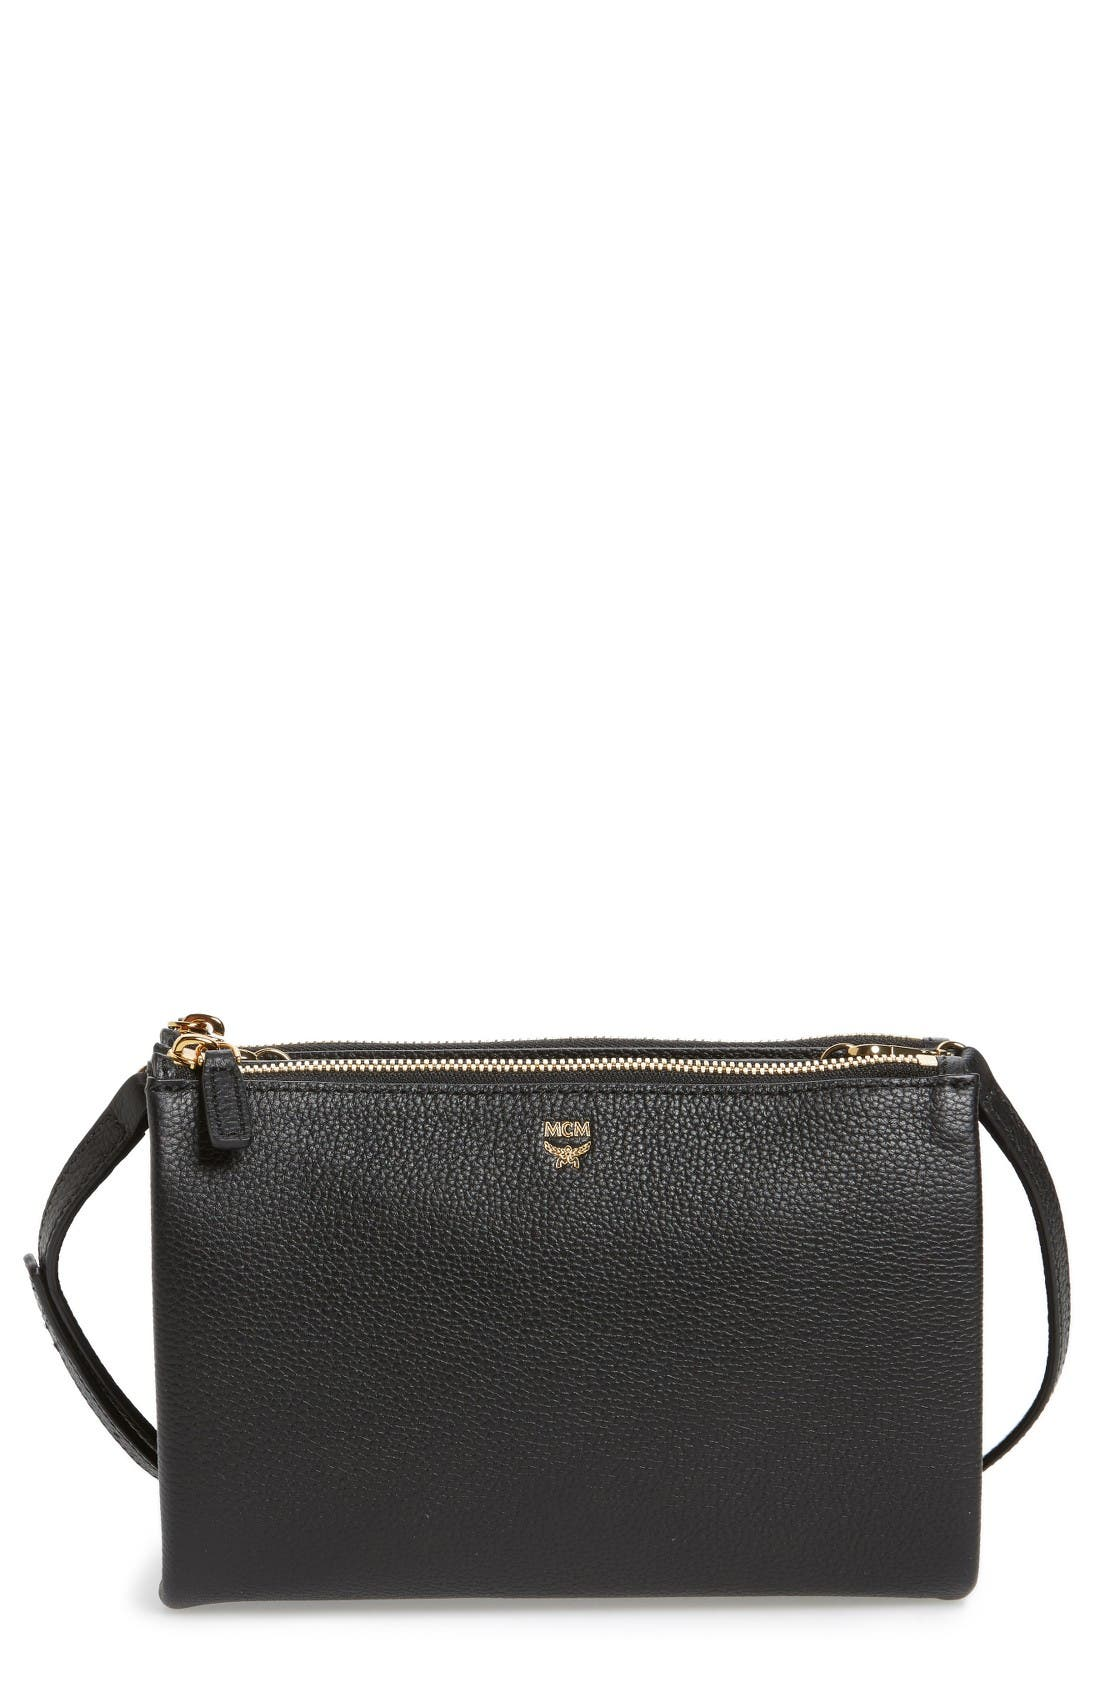 MCM Milla Double Leather Crossbody Bag